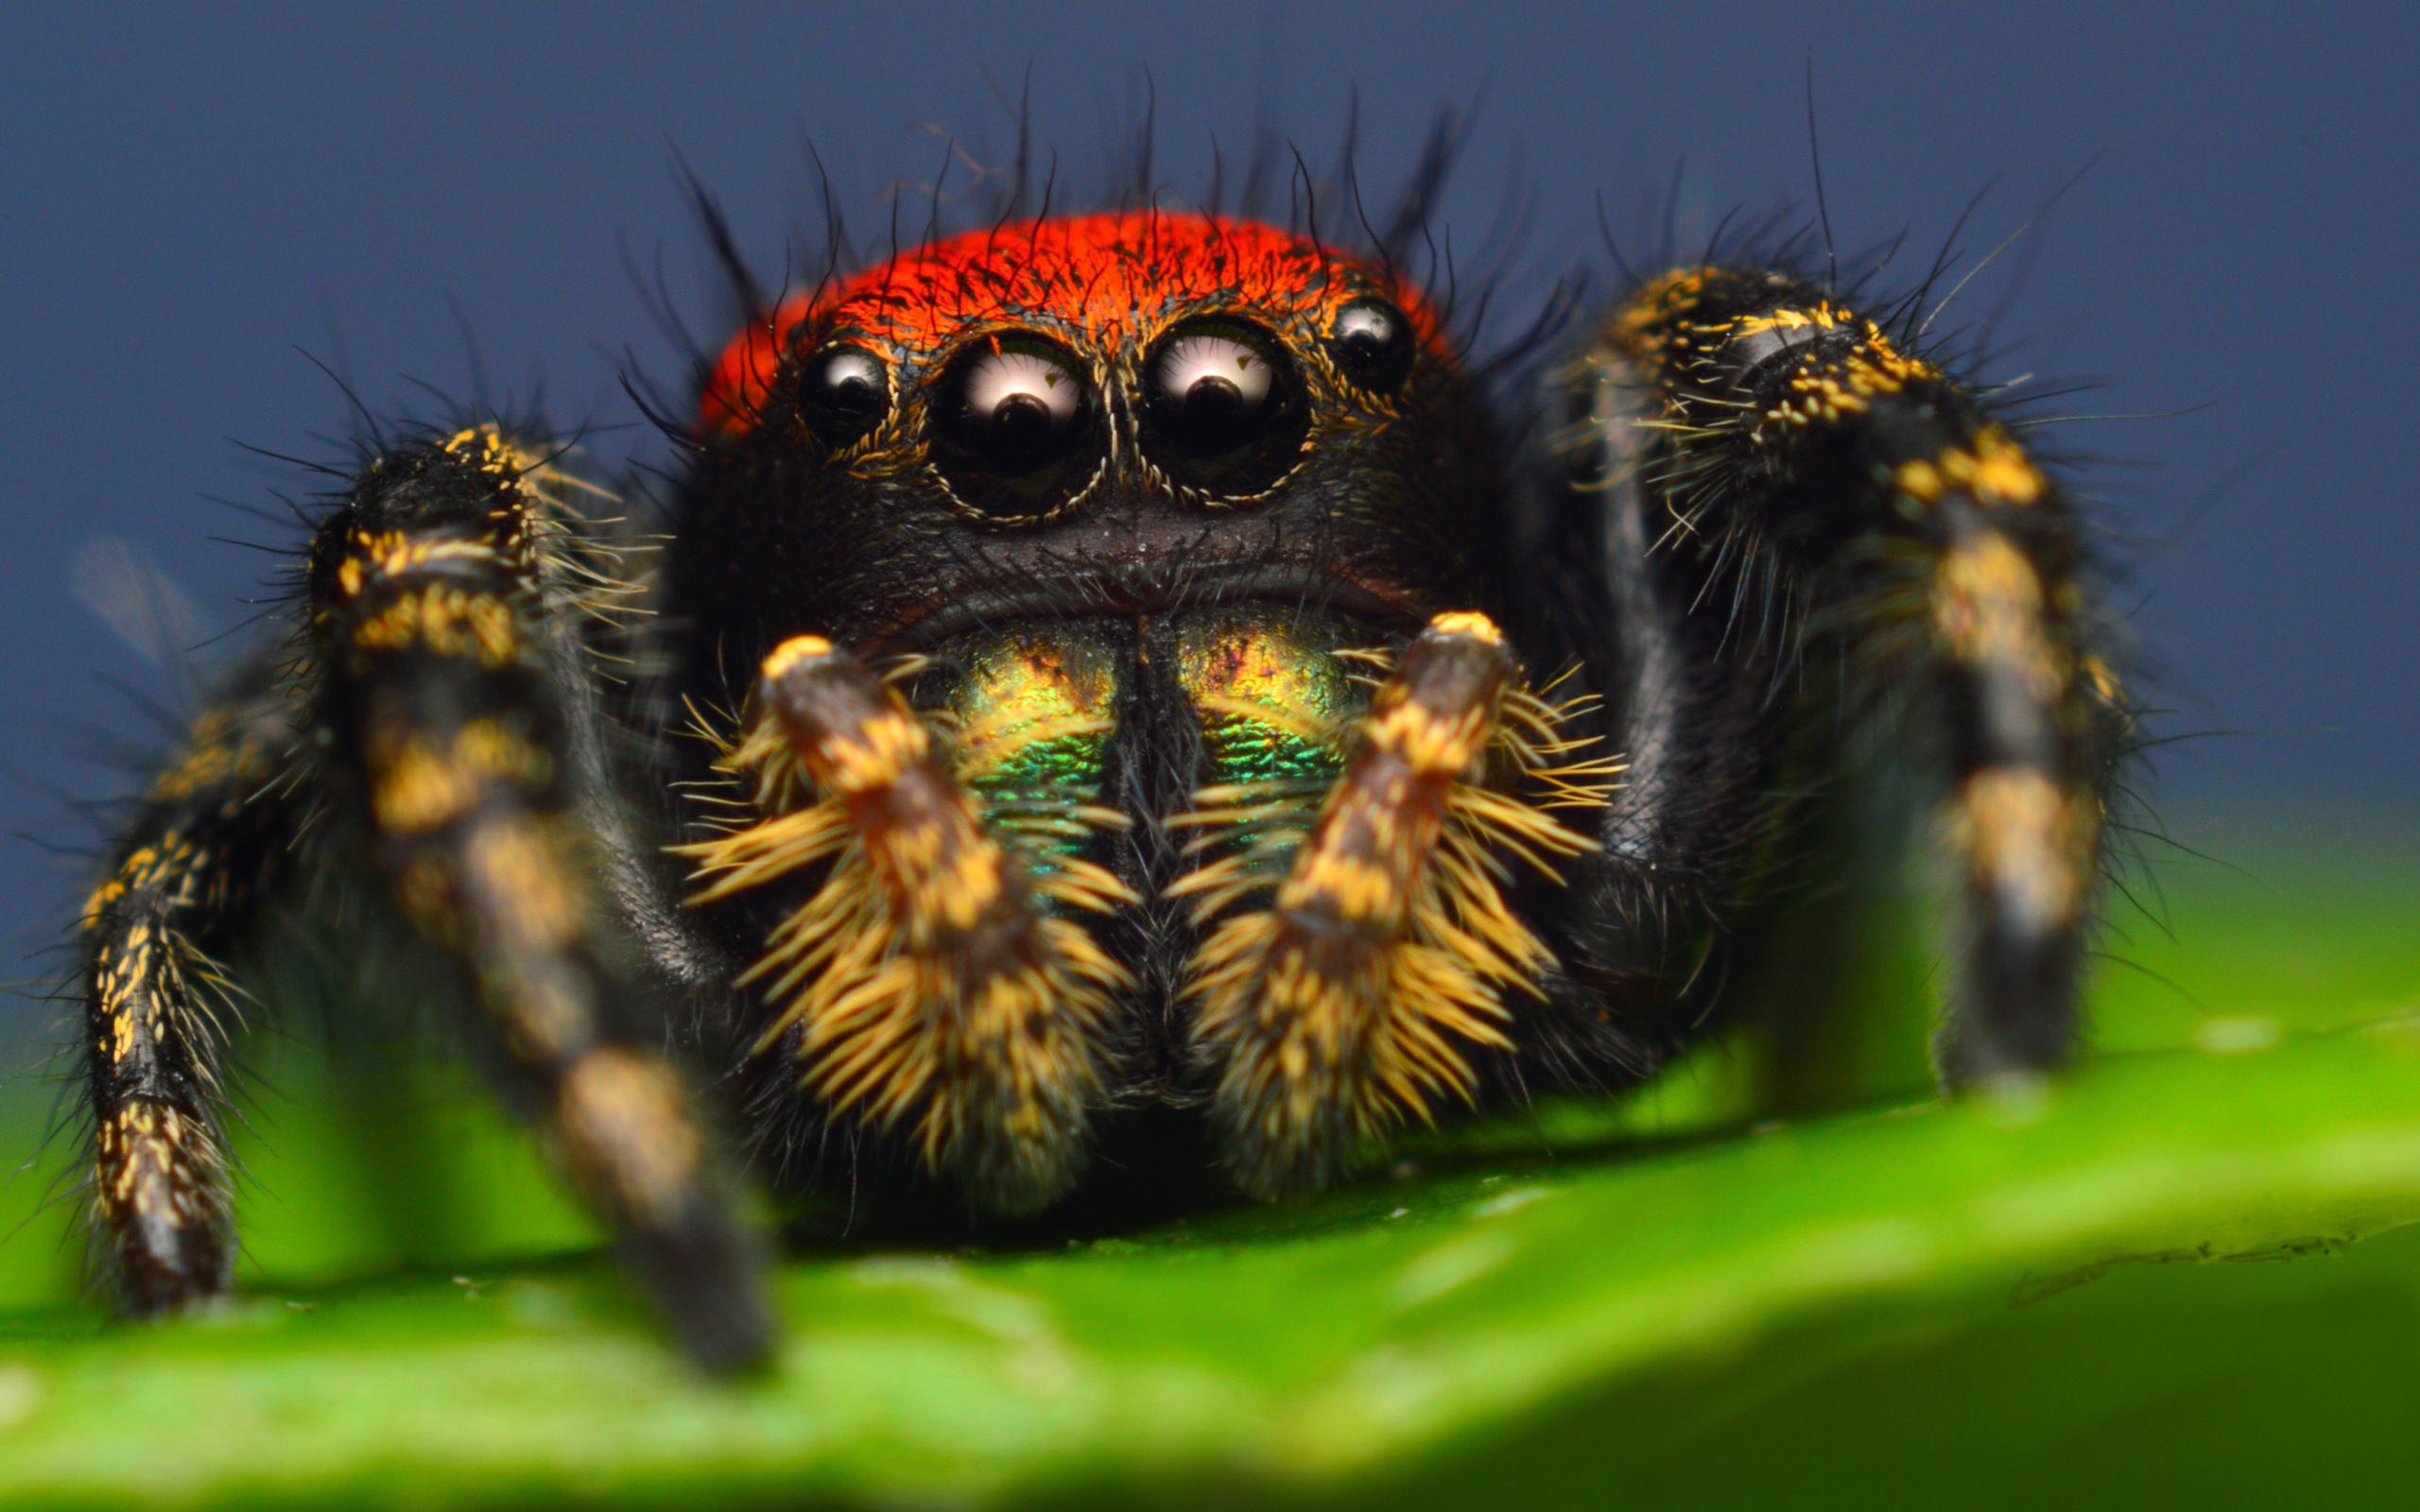 HDoboi.Kiev.ua - Паук скакун, насекомое паук картинки, макросъемка, животные